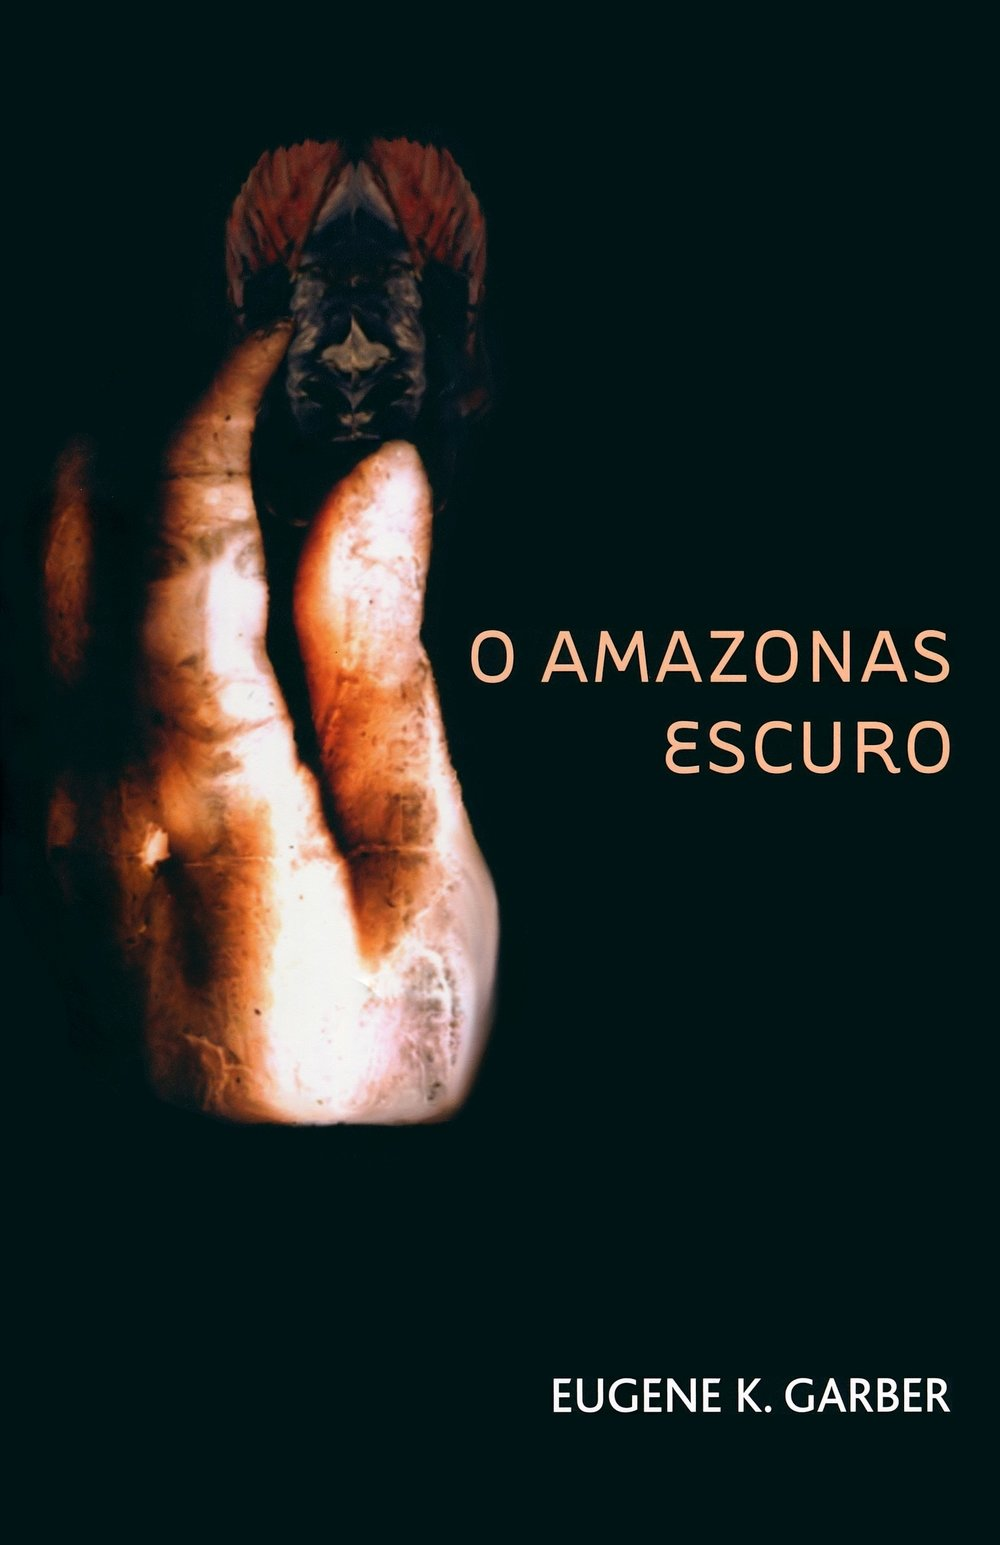 O Amazonas Escuro, Novel by Eugene K Garber, cover photo